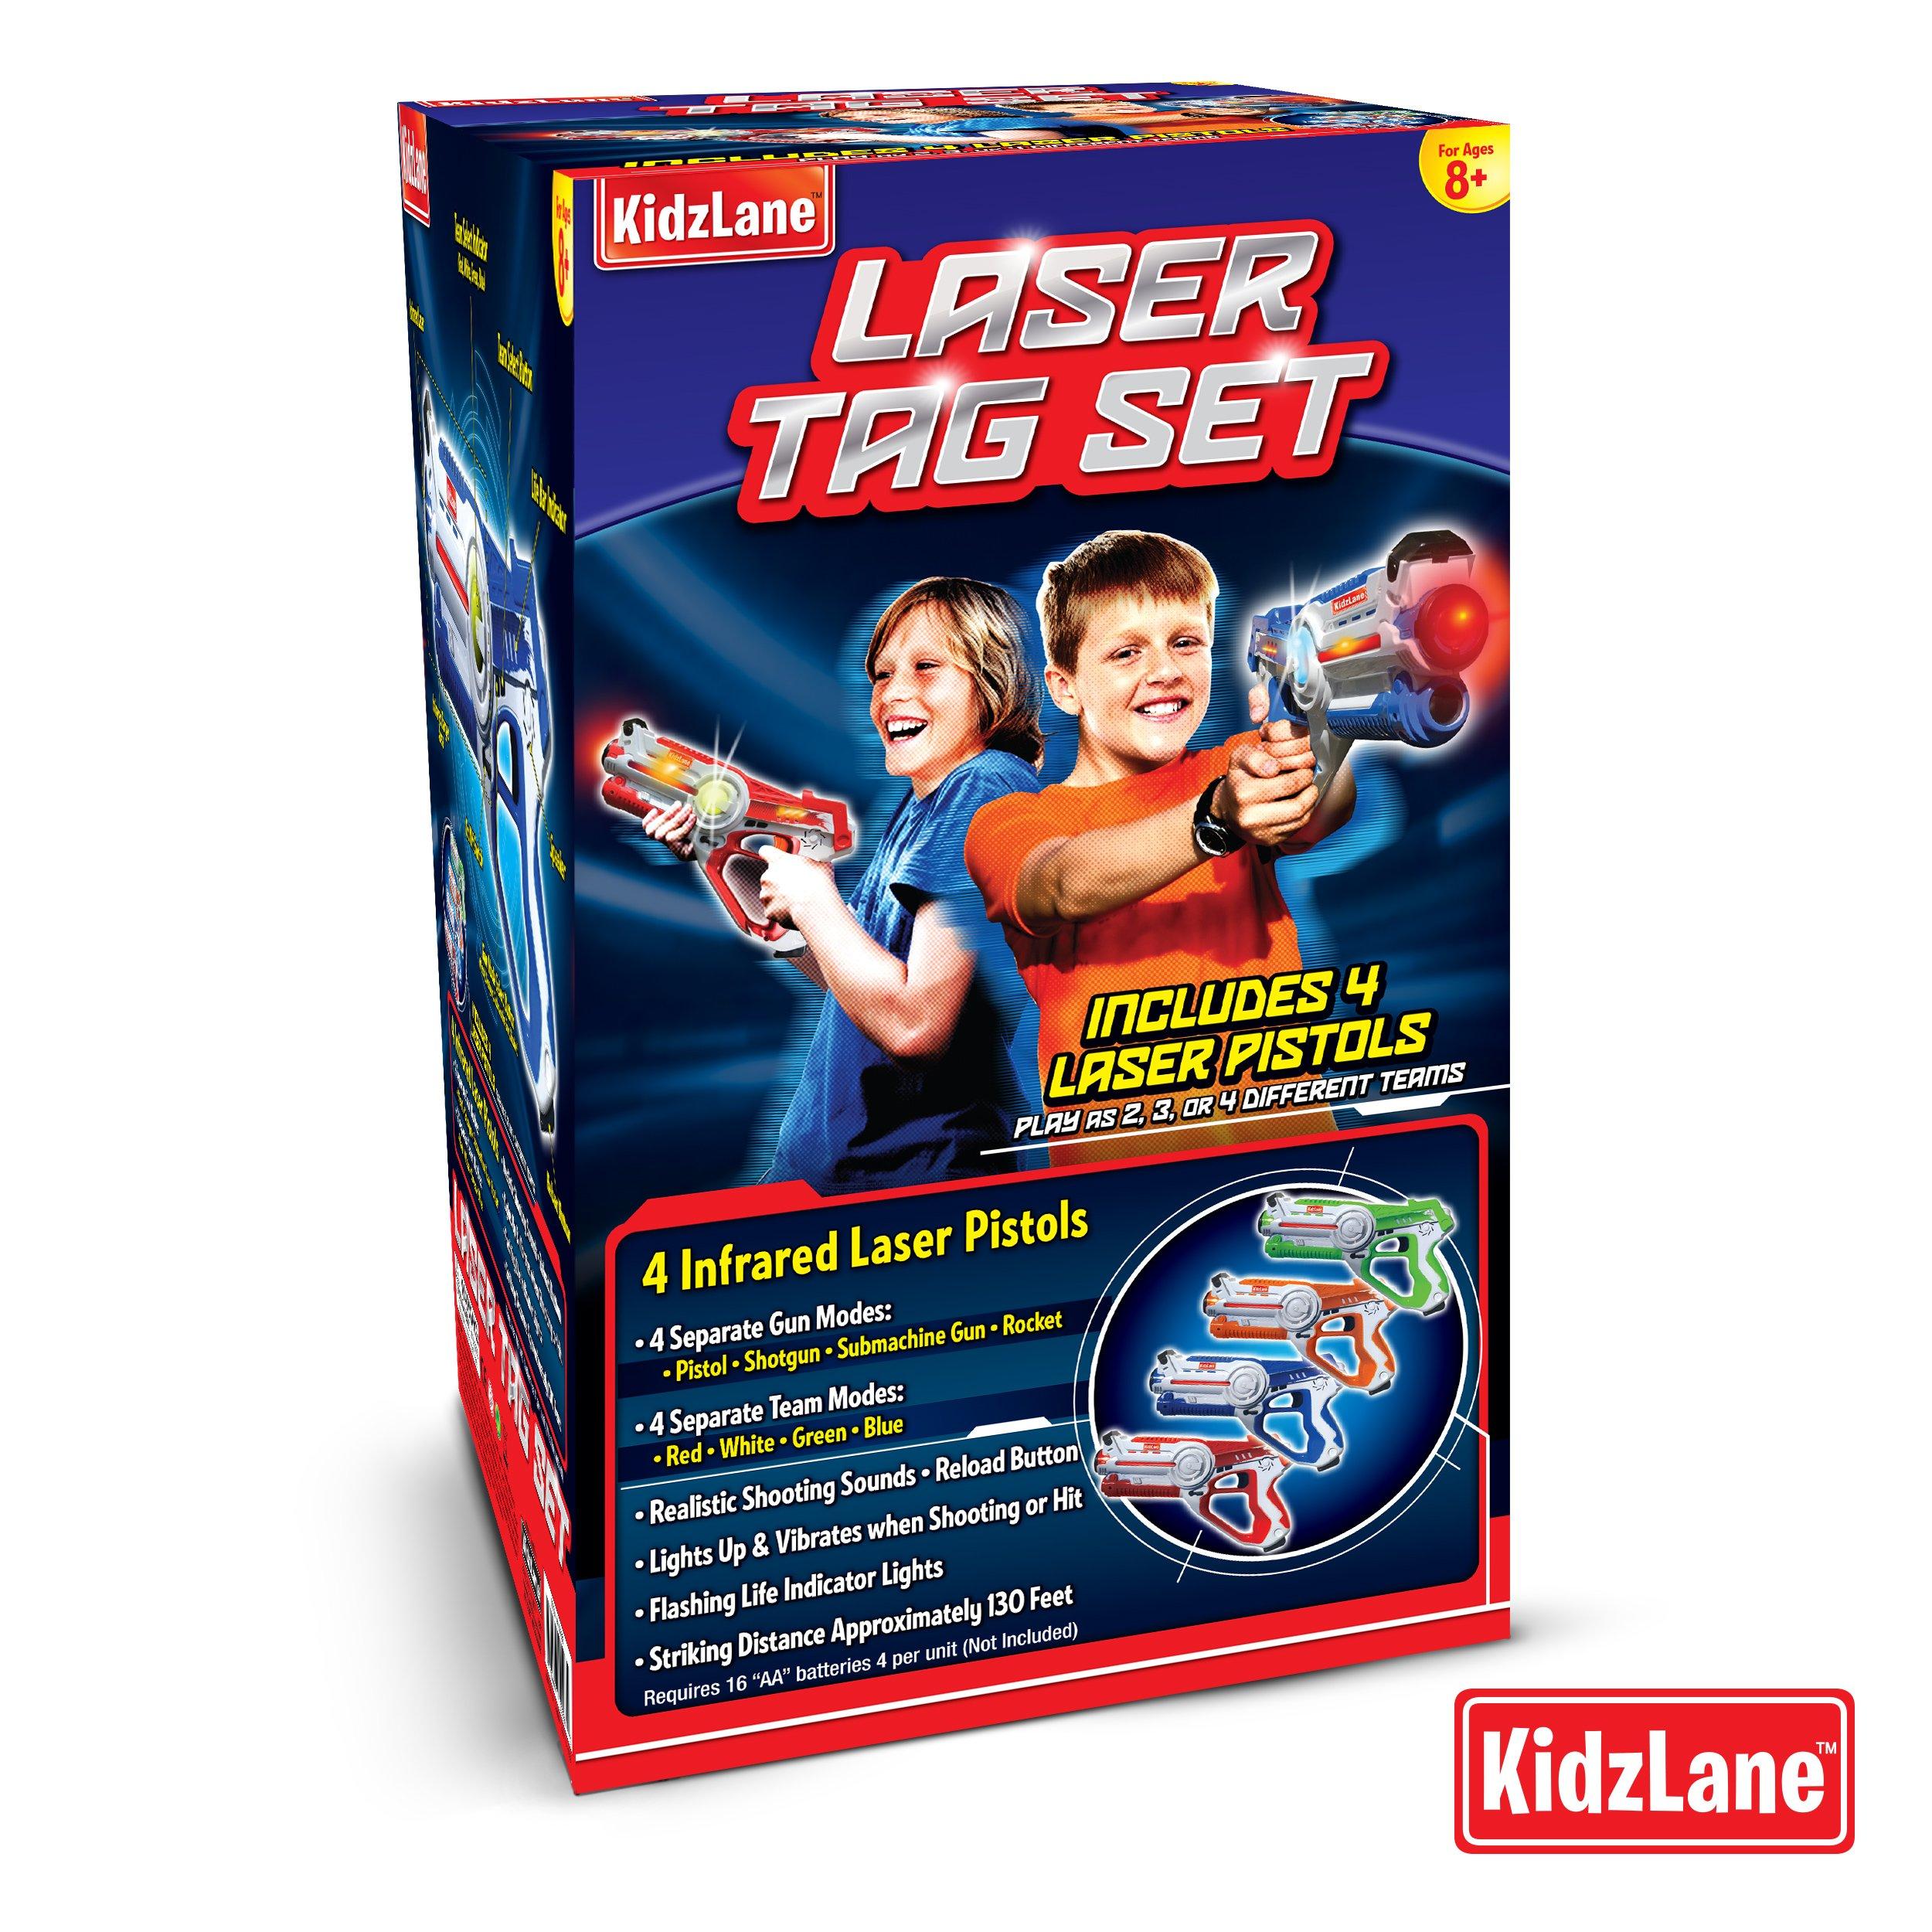 Kidzlane Infrared Laser Tag : Game Mega Pack - Set of 4 Players - Infrared Laser Gun Indoor and Outdoor Group Activity Fun. Infrared 0.9mW by Kidzlane (Image #6)